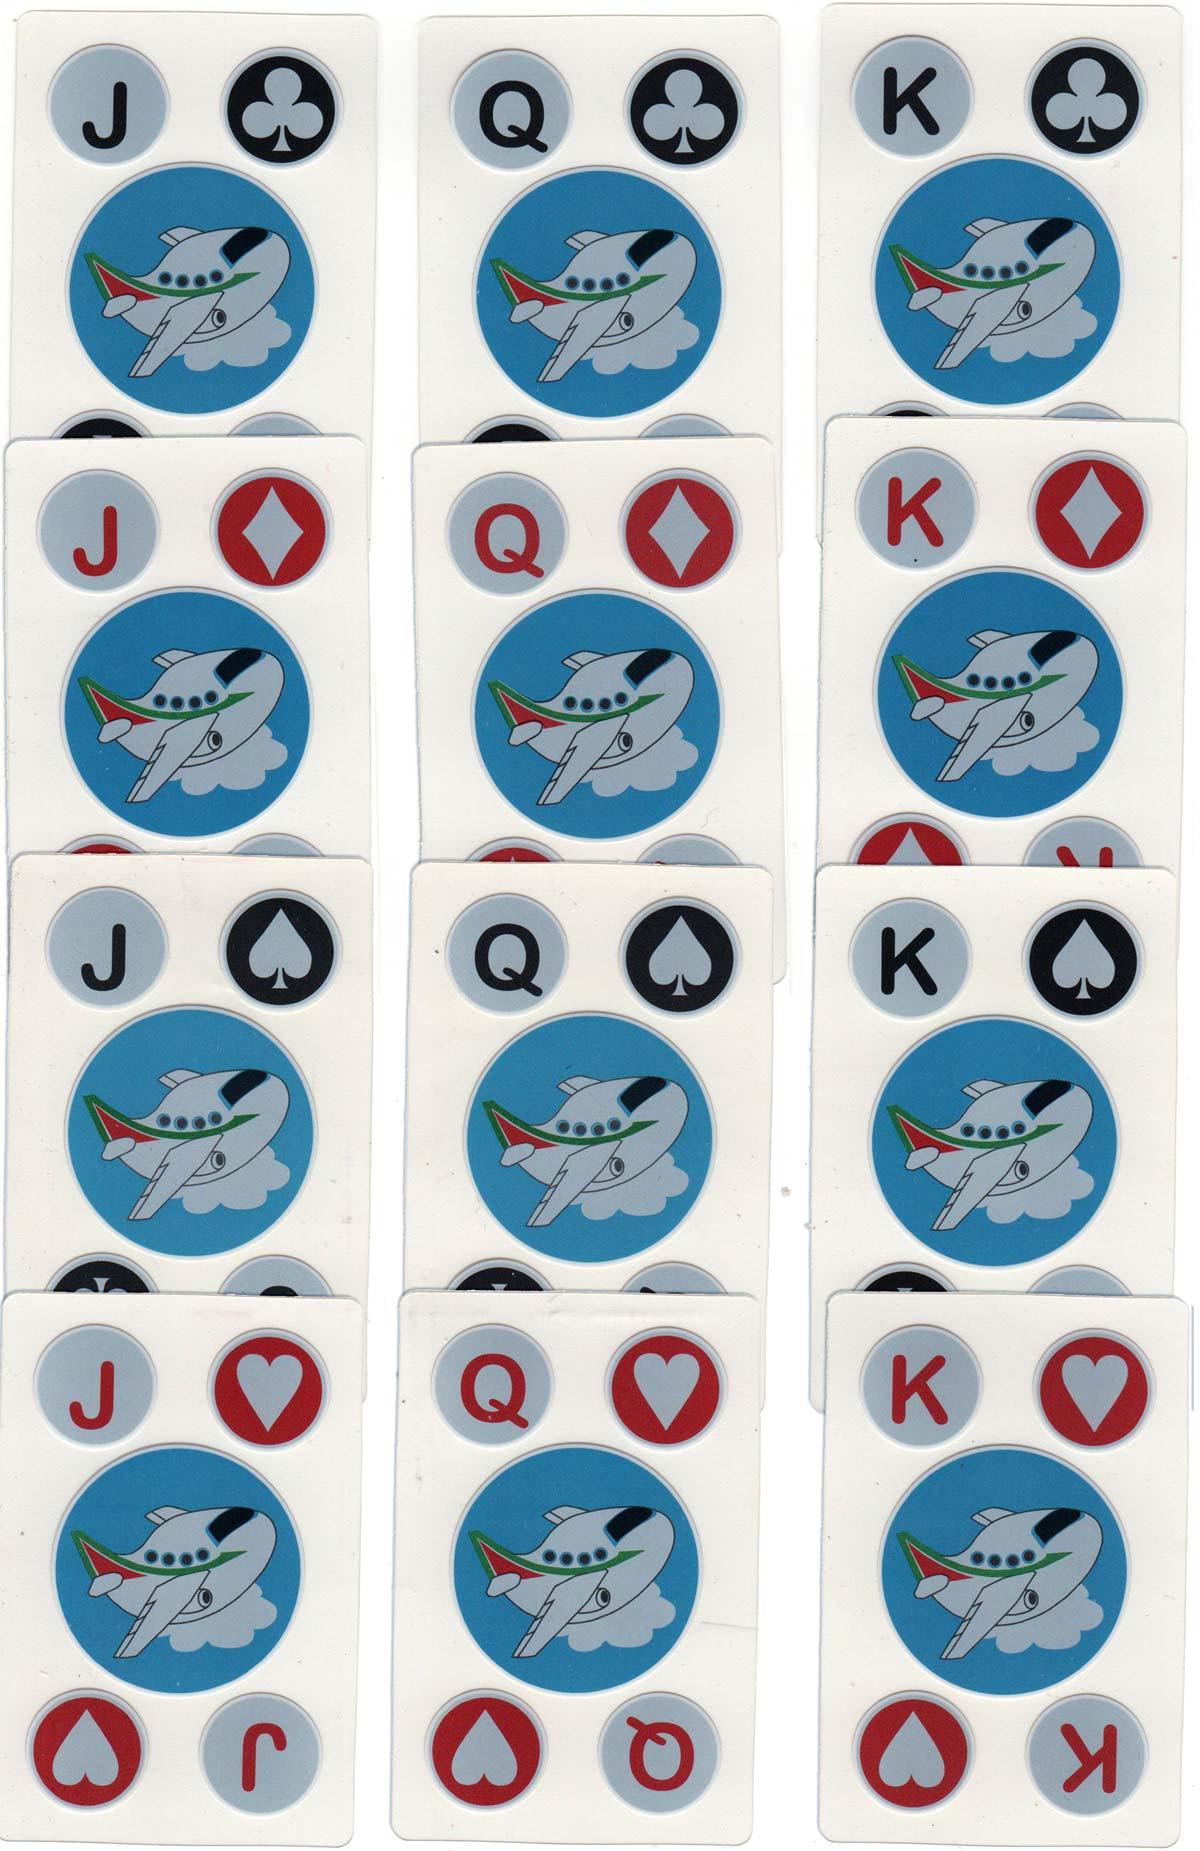 Alitalia advertising deck produced by Premier Portfolio International Ltd